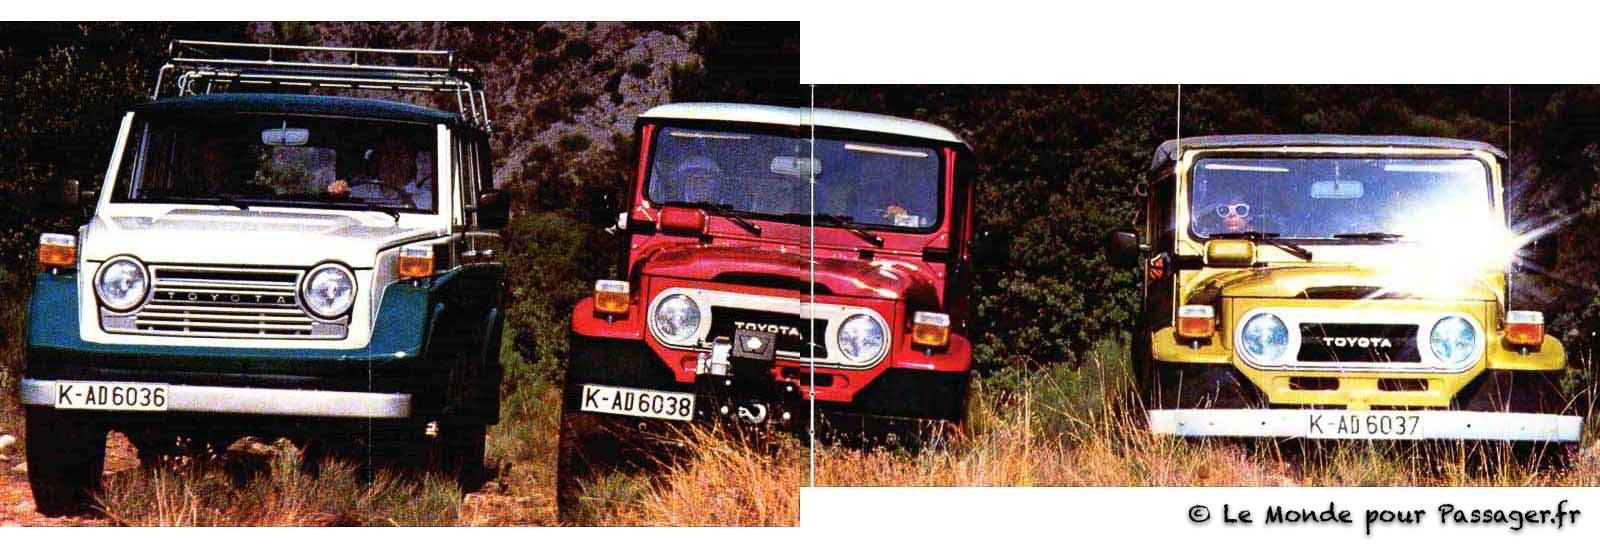 Fj55-Pubtoyota1978-Allemagne002